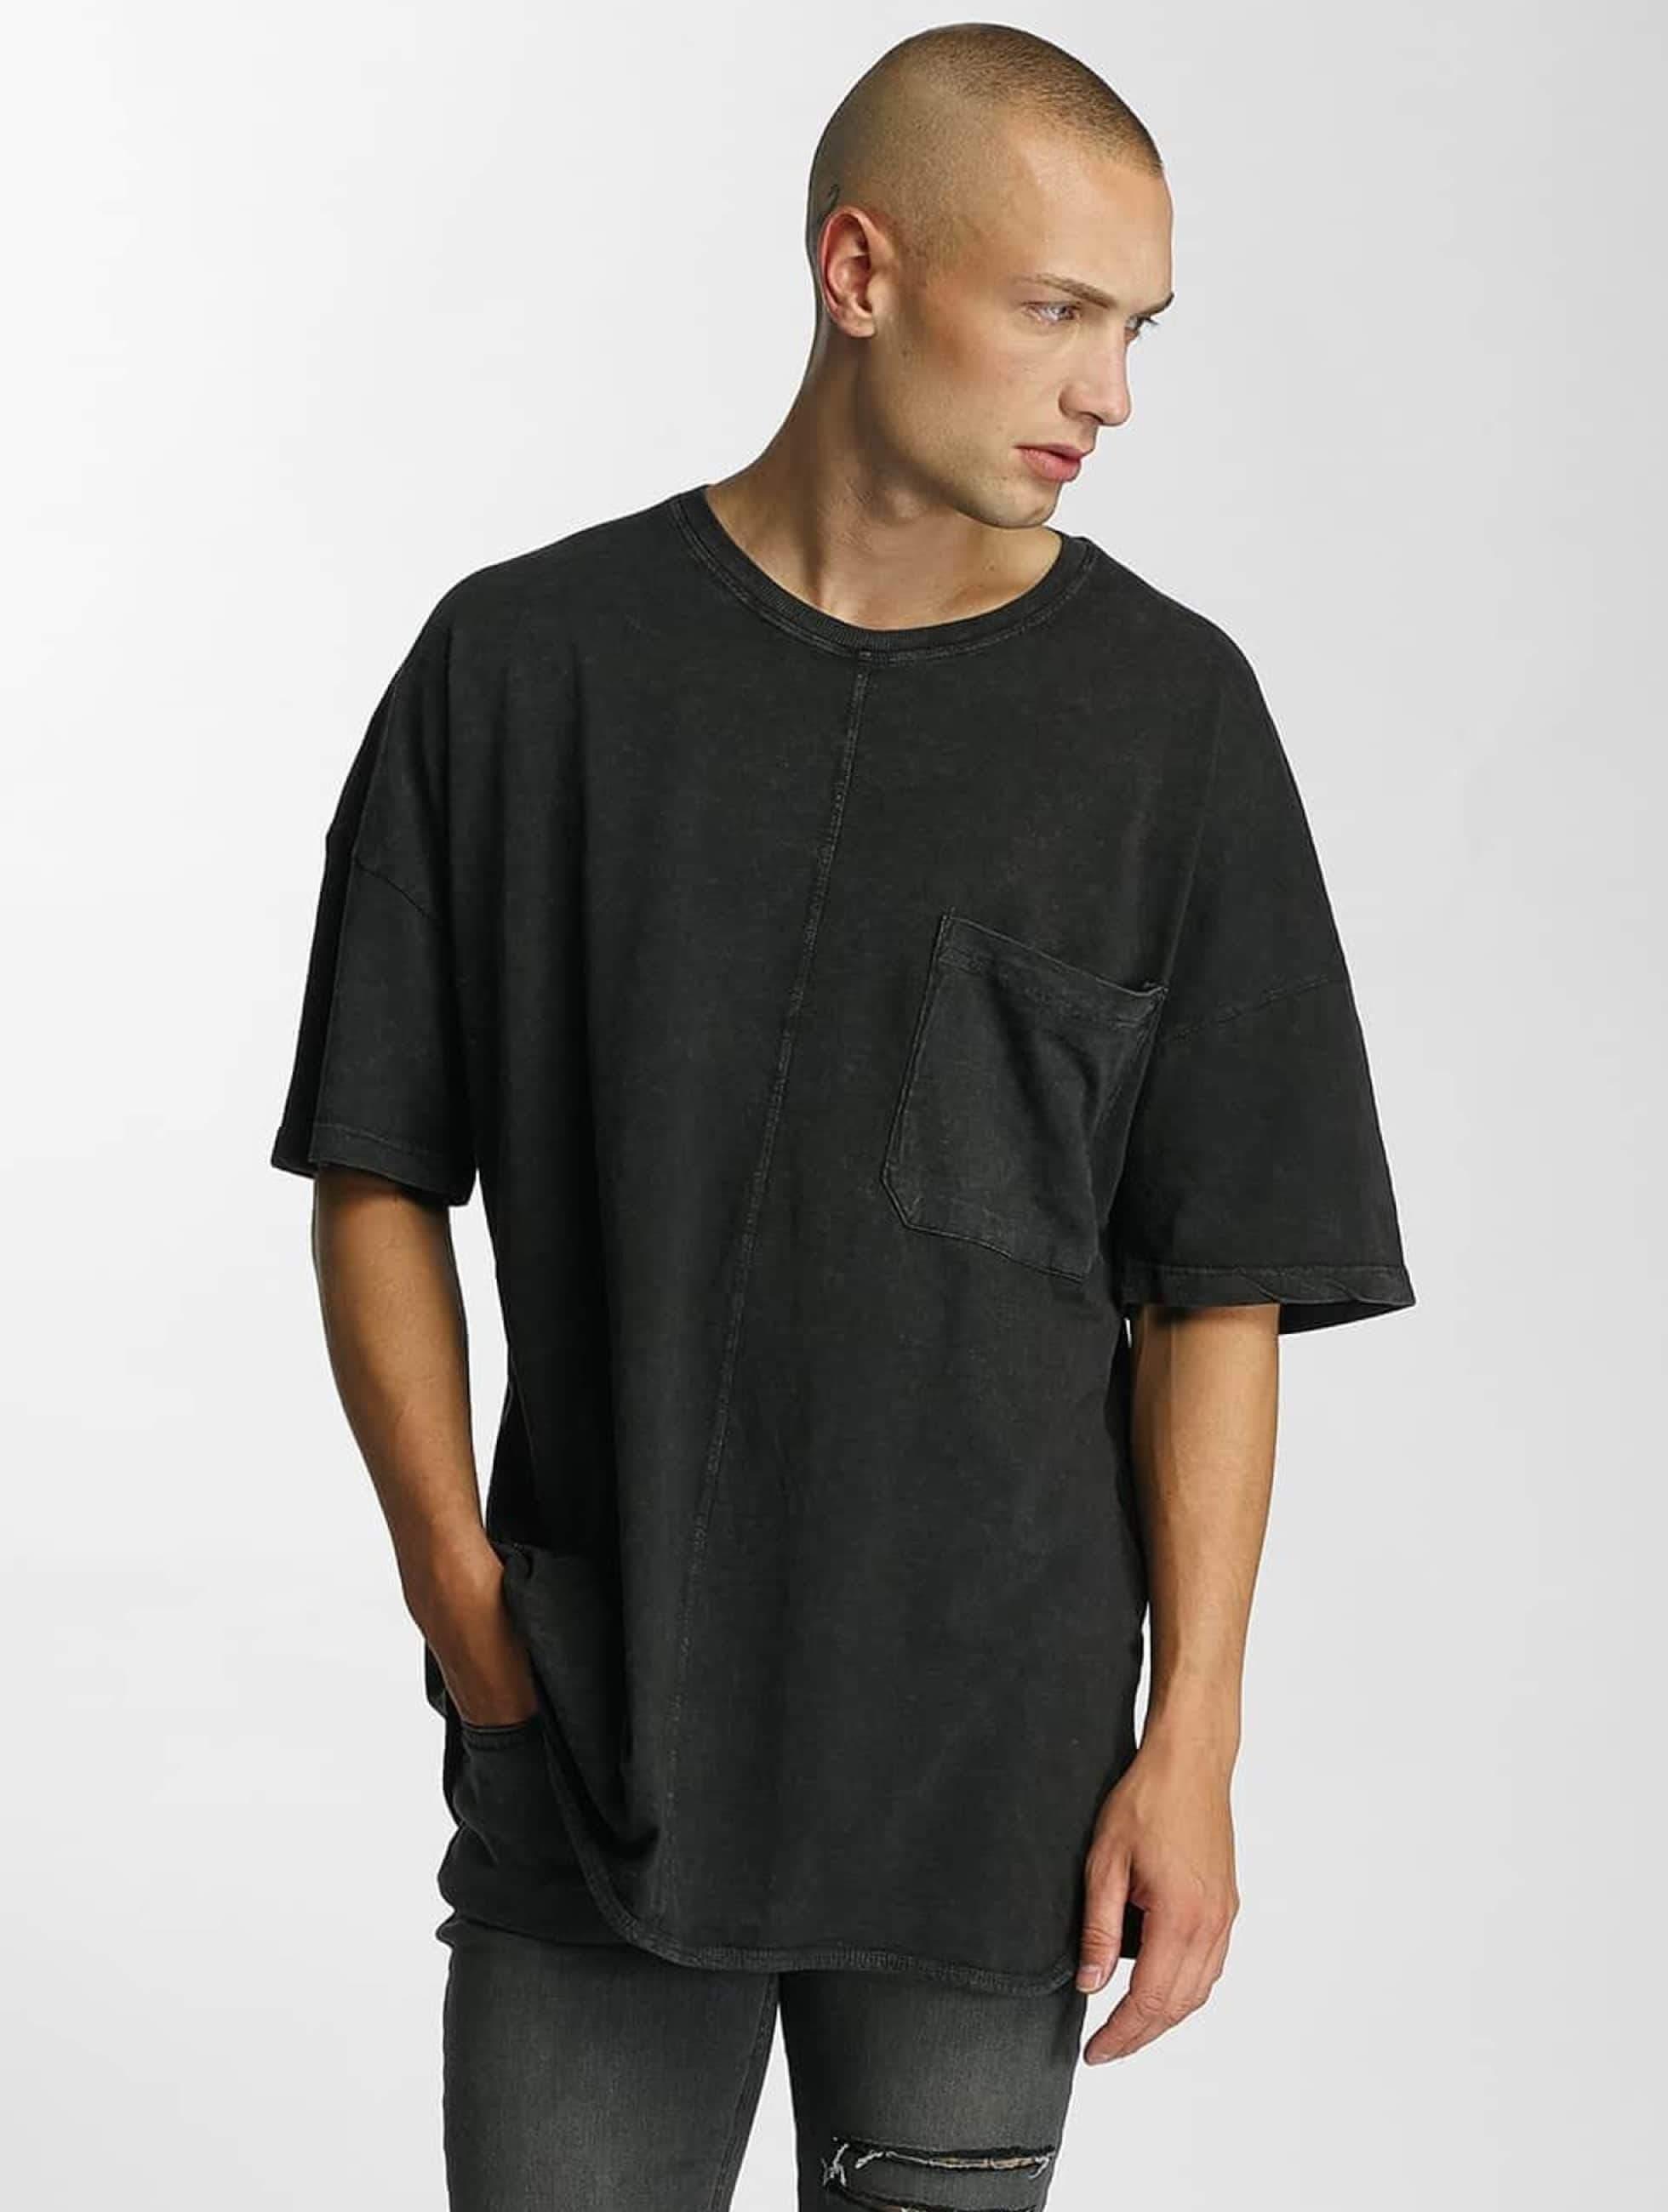 Bangastic / T-Shirt Zeus in black S